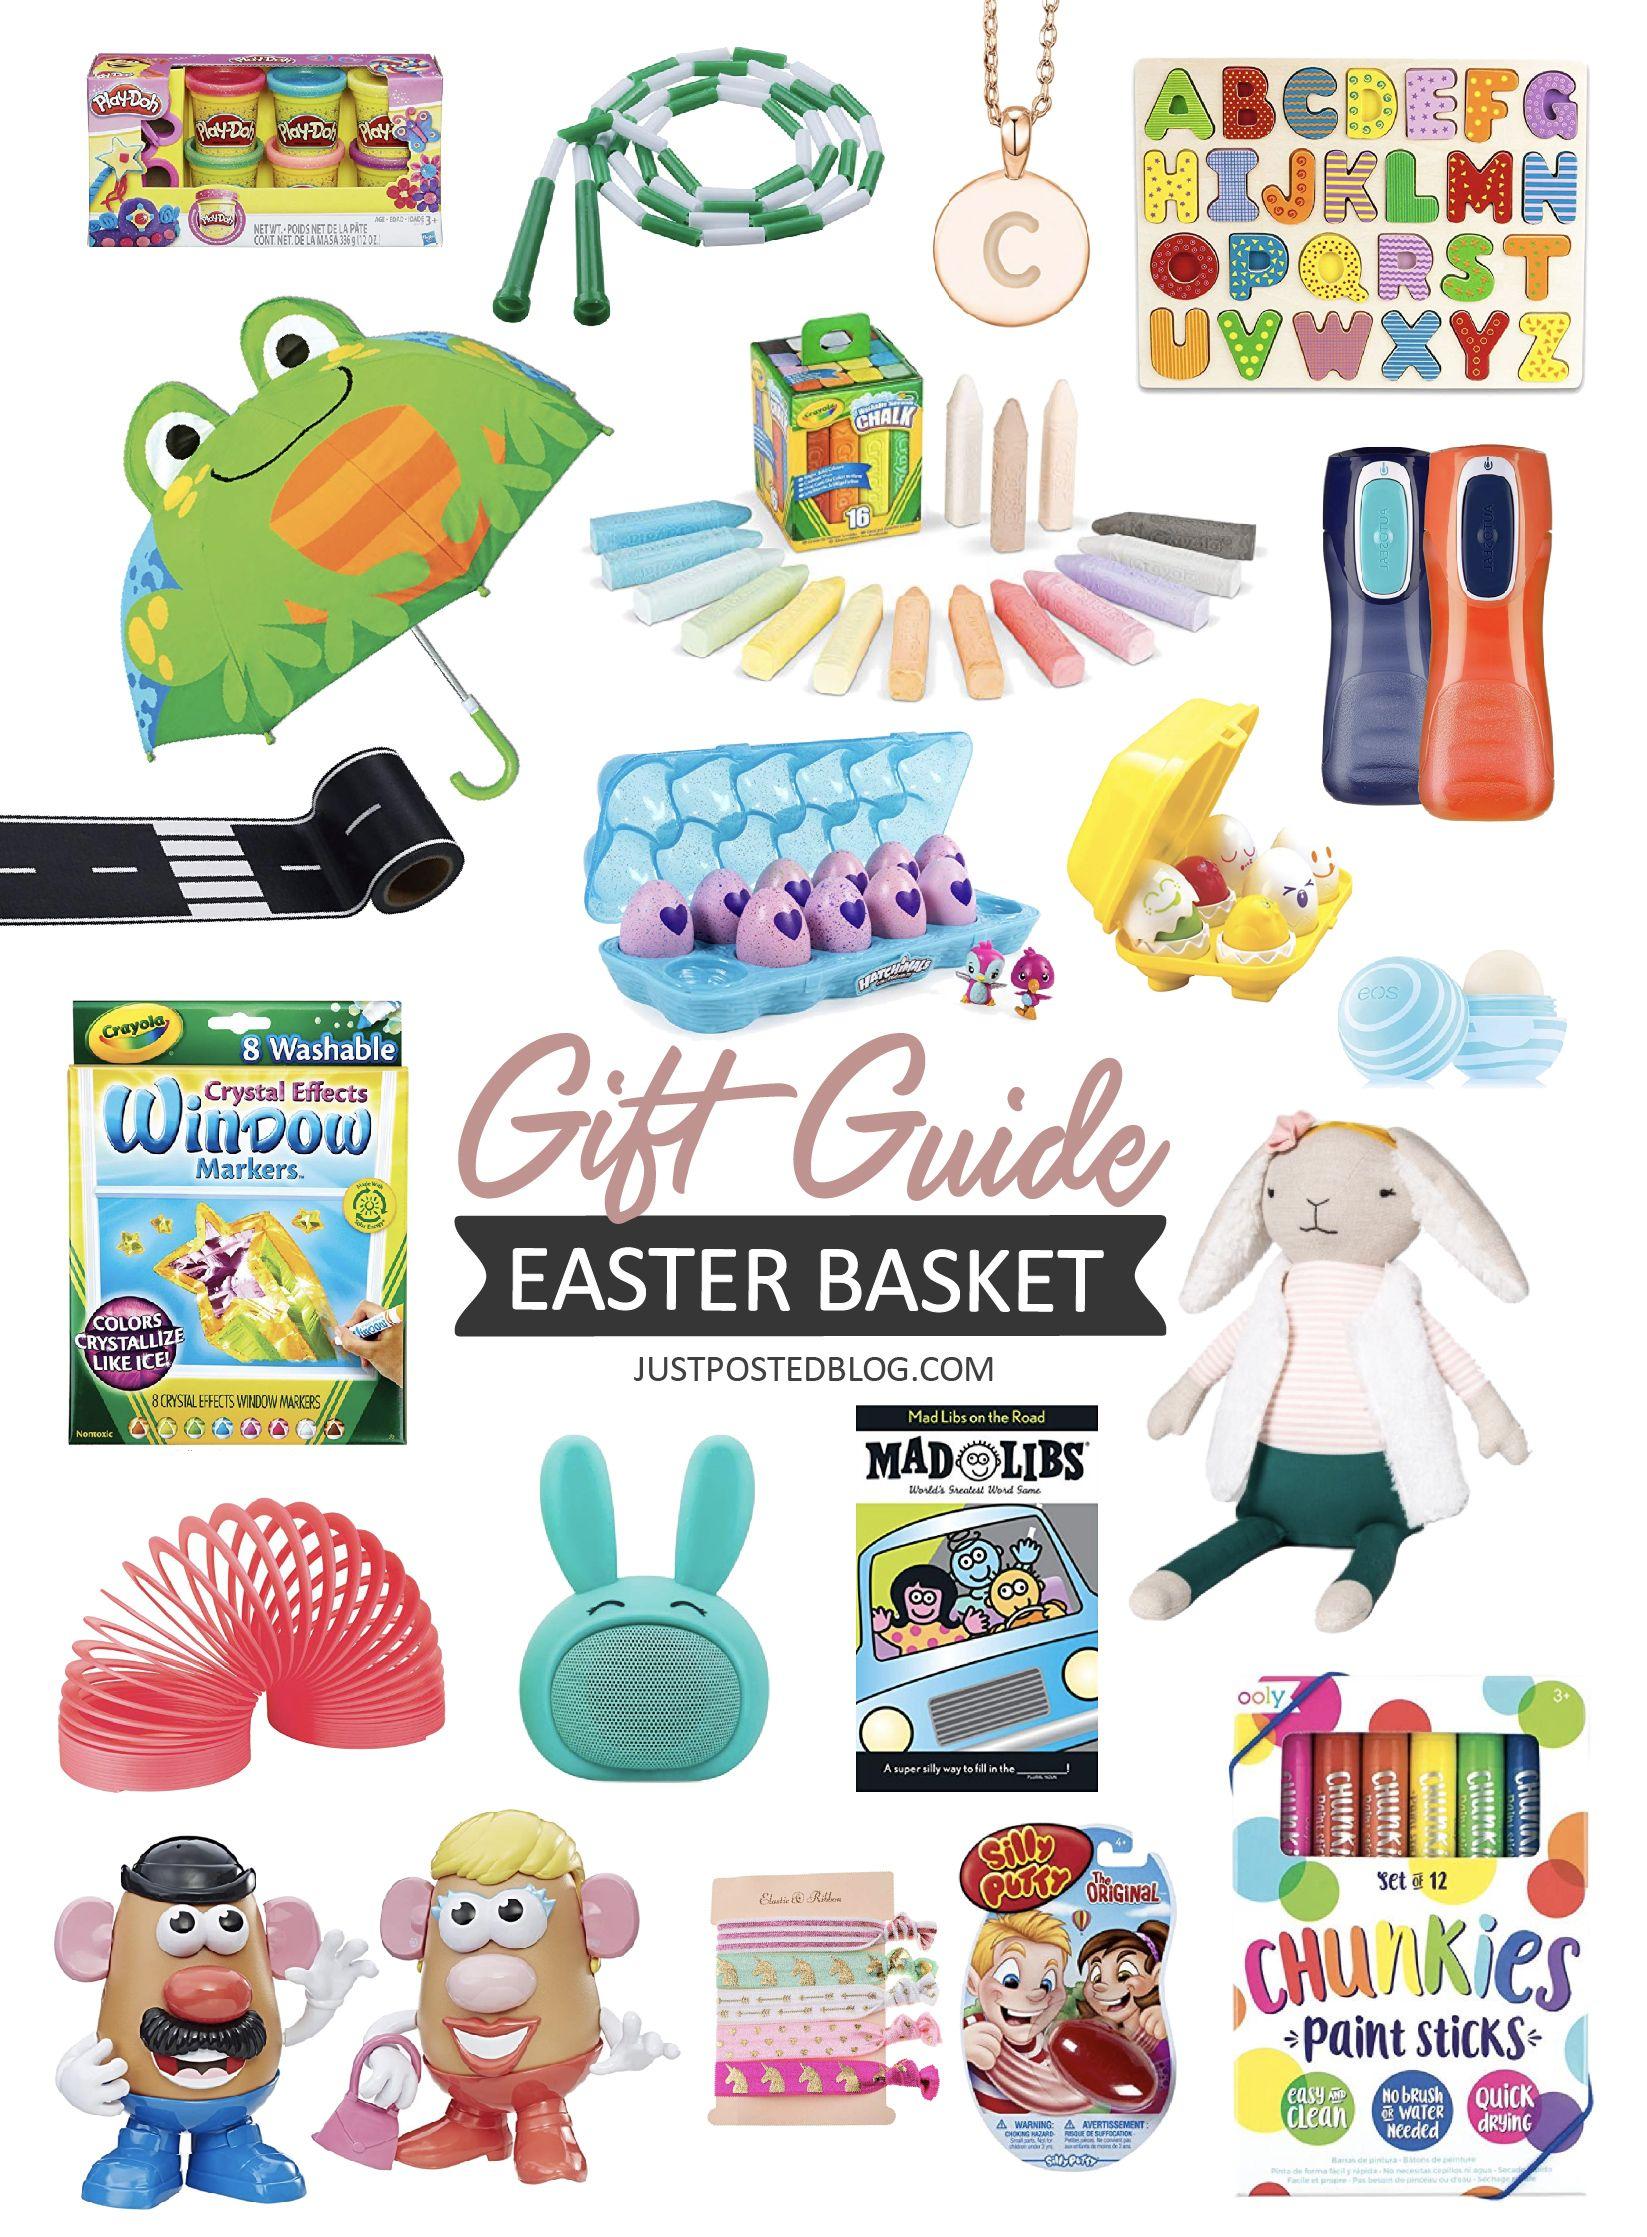 réflexions sur magasin meilleurs vendeurs la réputation d'abord Here is an Gift guide for Easter Baskets for kids! Lots of ...